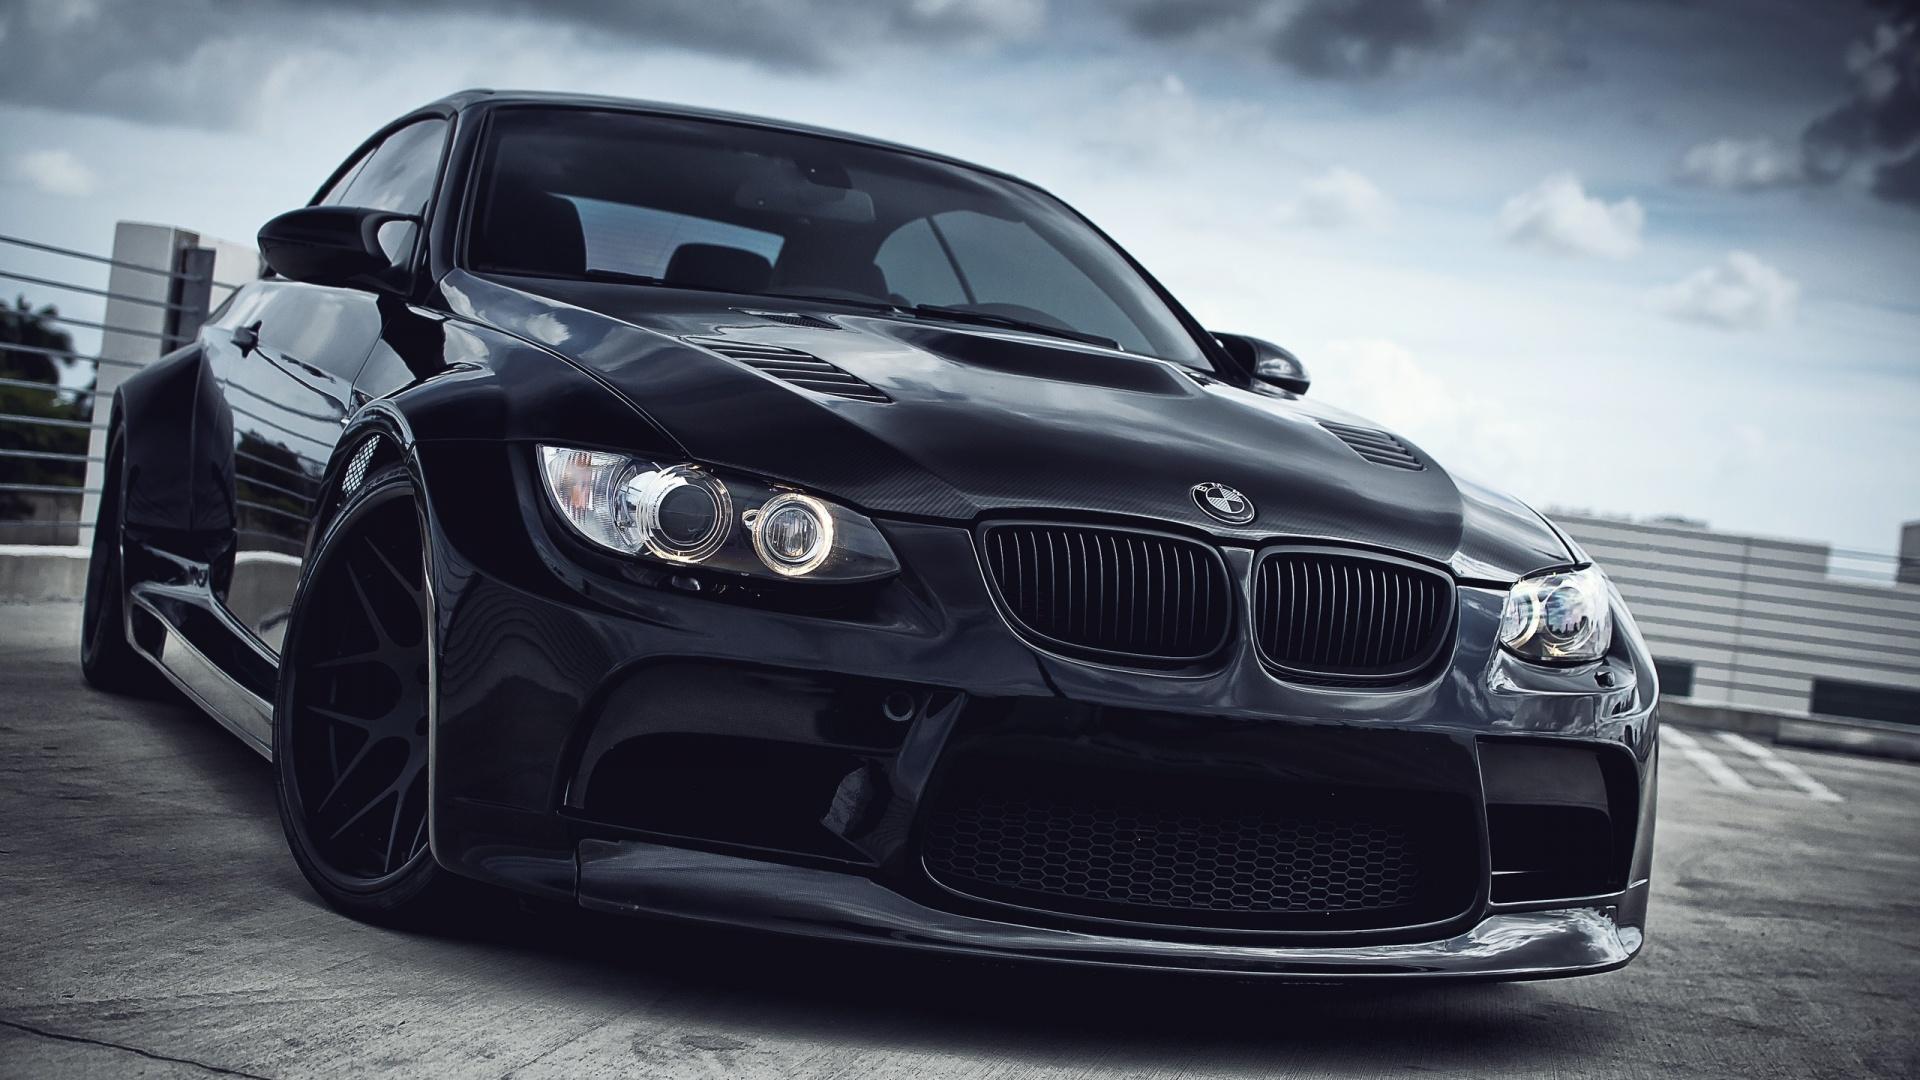 BMW Kampanyası Son Tarih 30 Nisan